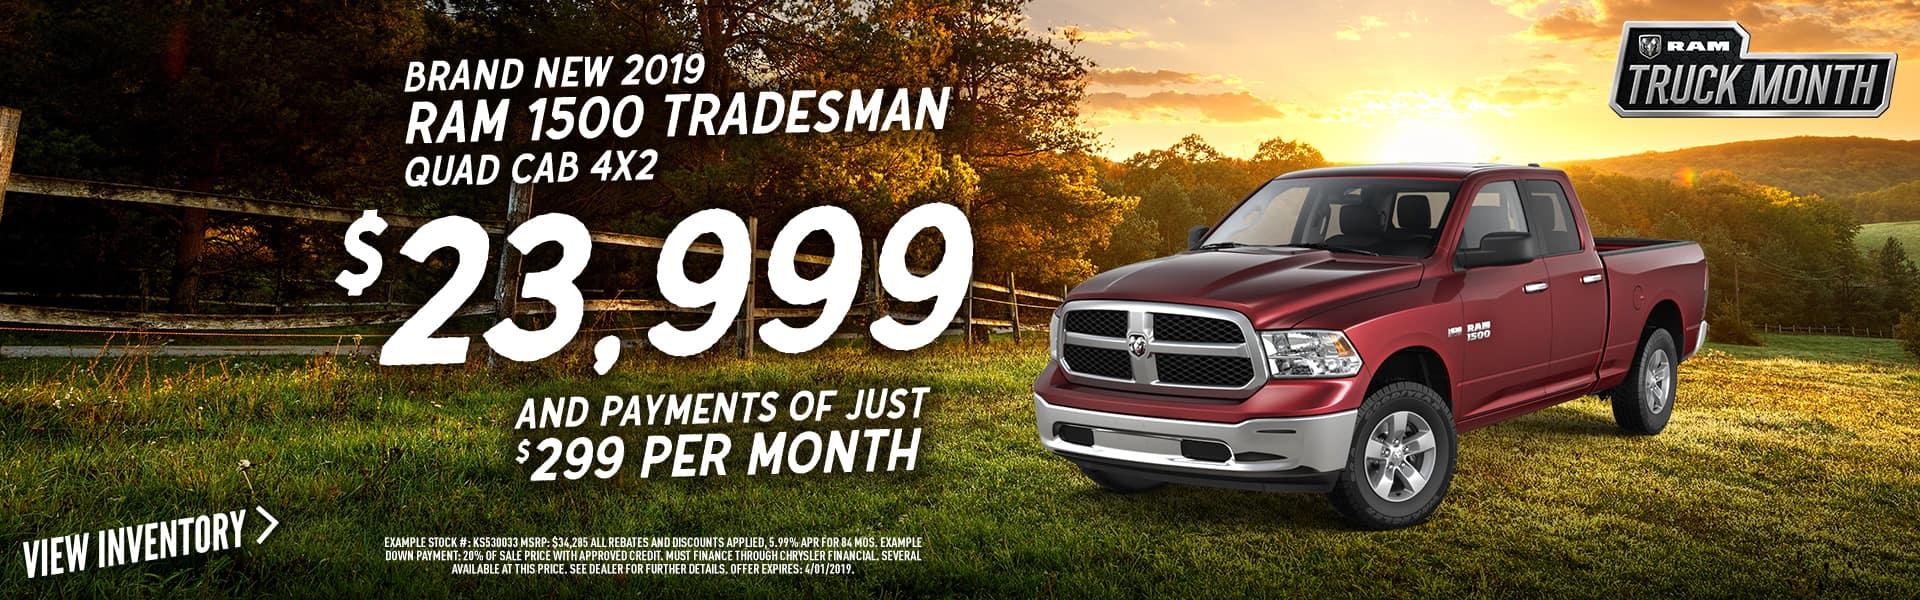 2019-ram-tradesman-quad-cab-for-23999-tulsa